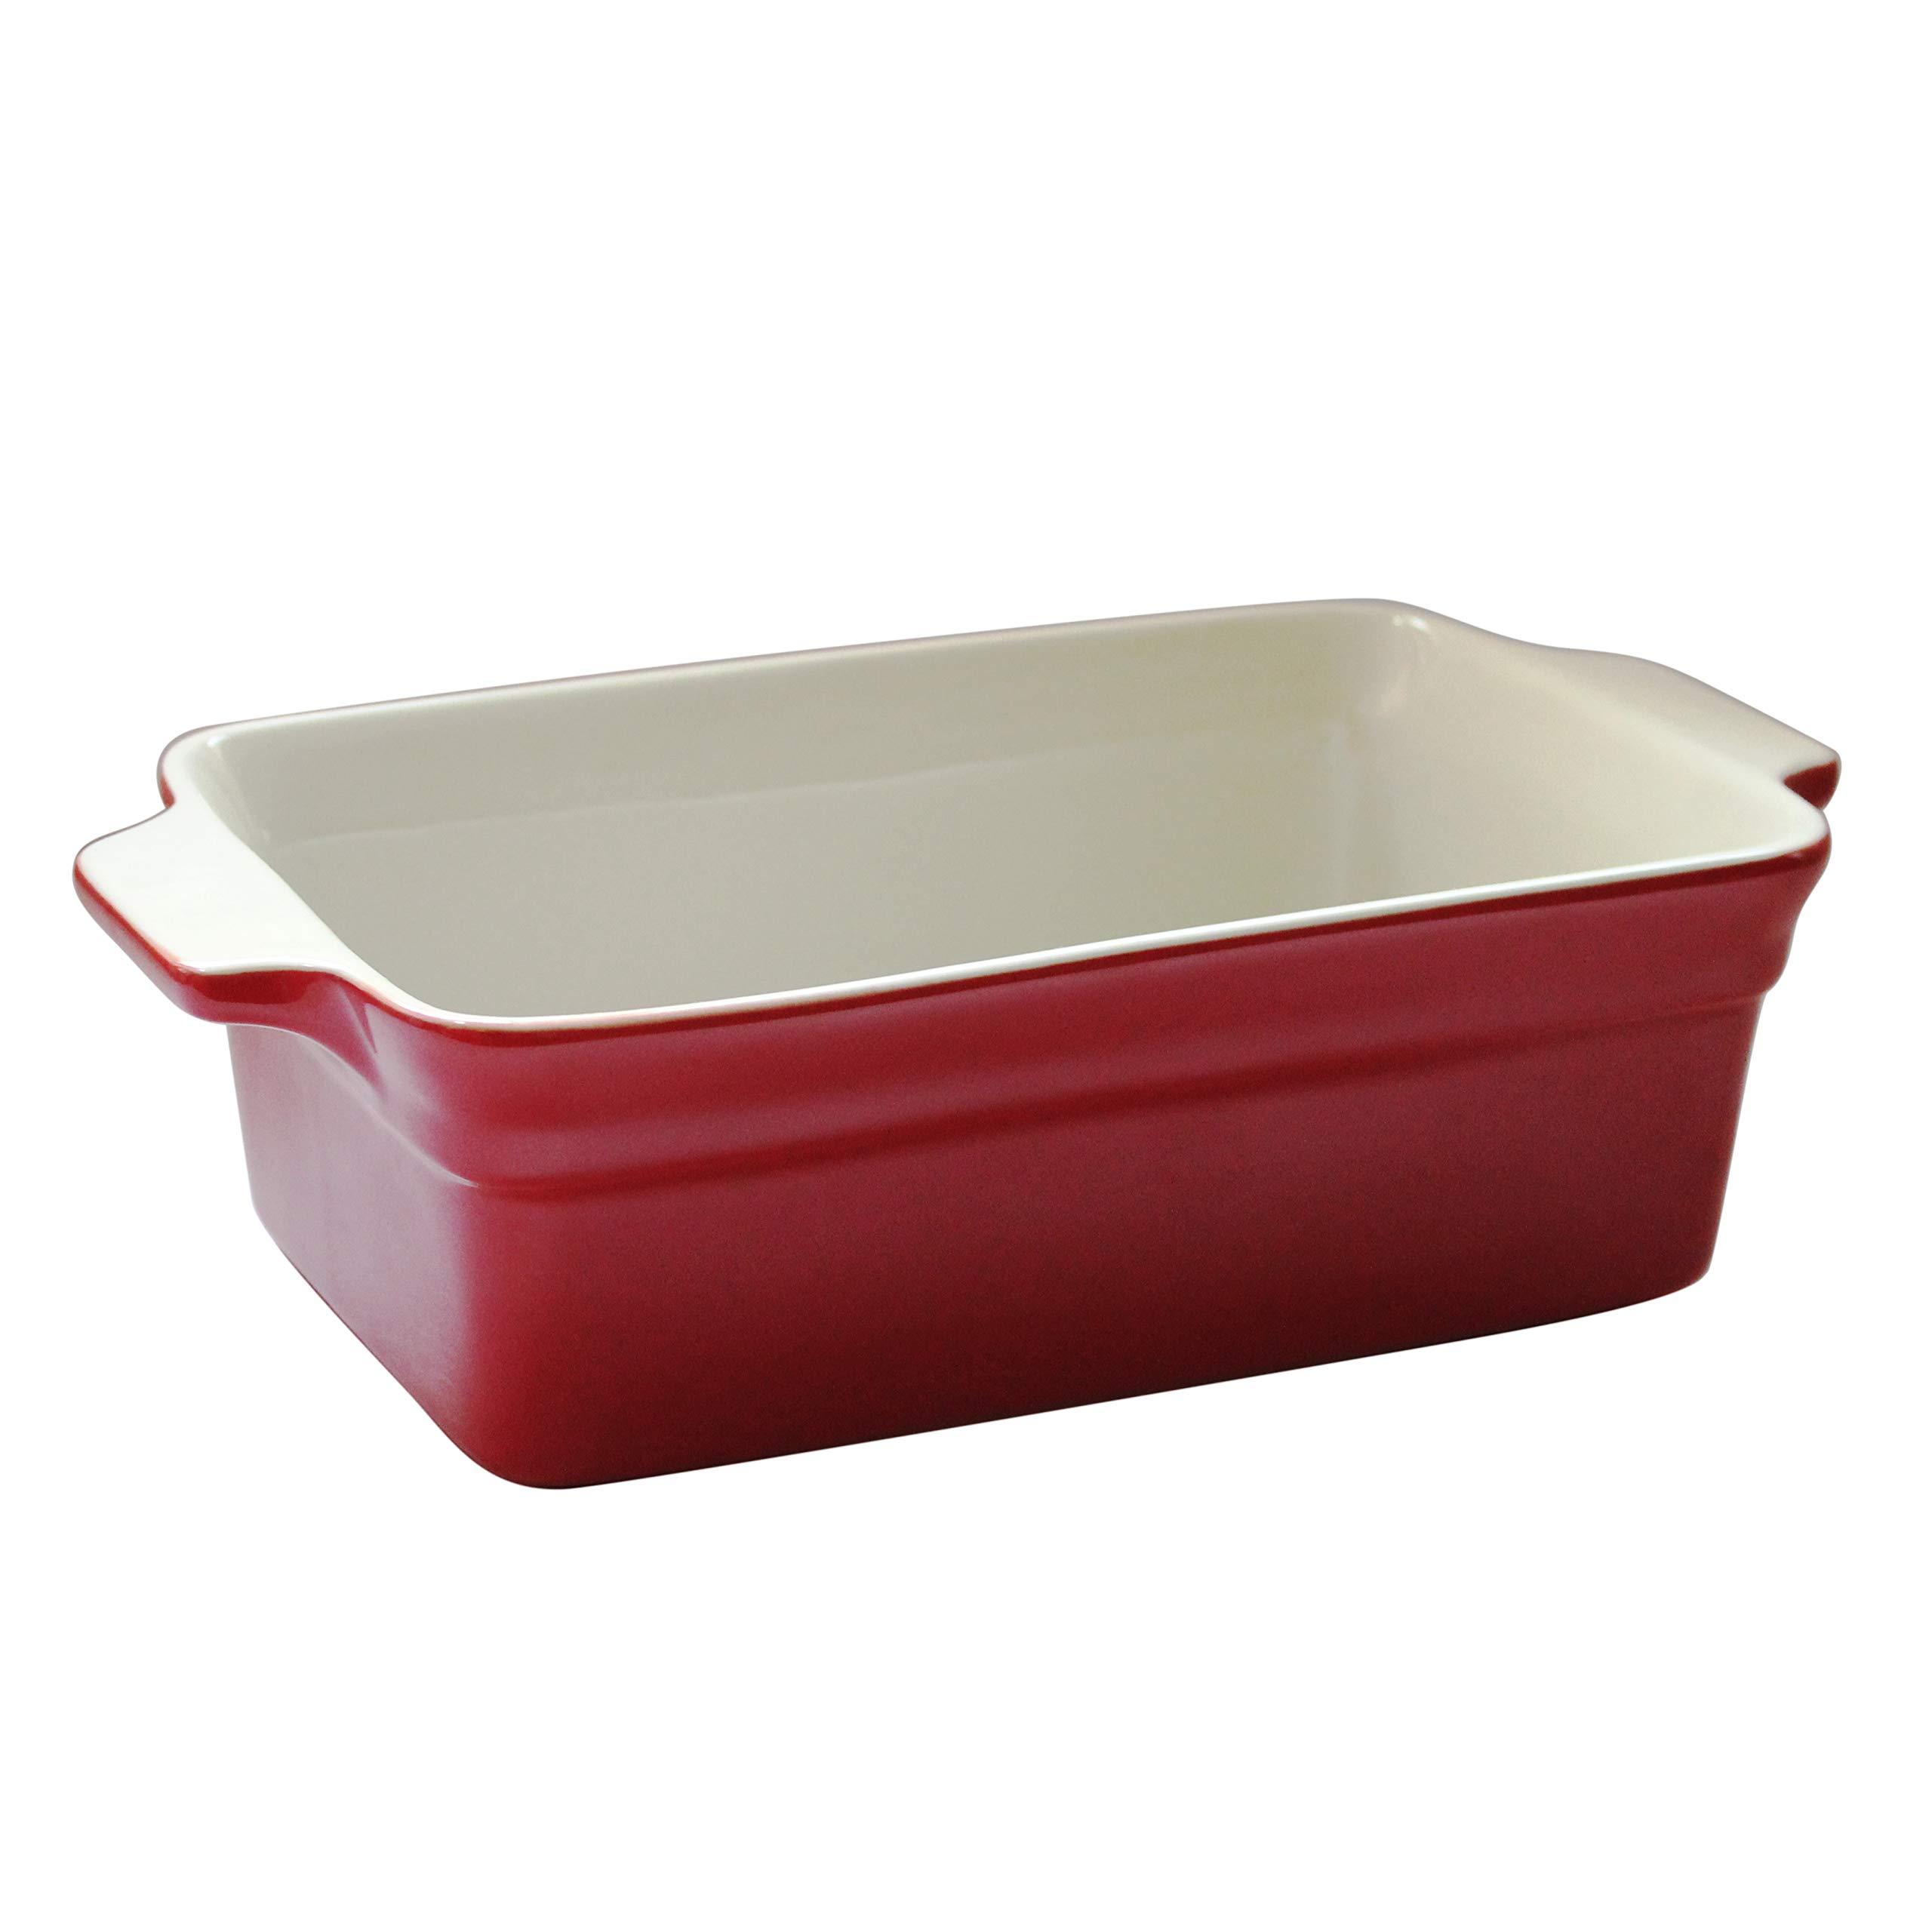 Lonovel Rectangular Baking Dish Roasting Lasagna Pan,11.5-Inch Classic Stoneware Ceramic Large Rectangular Bakers,Red by Lonovel (Image #1)